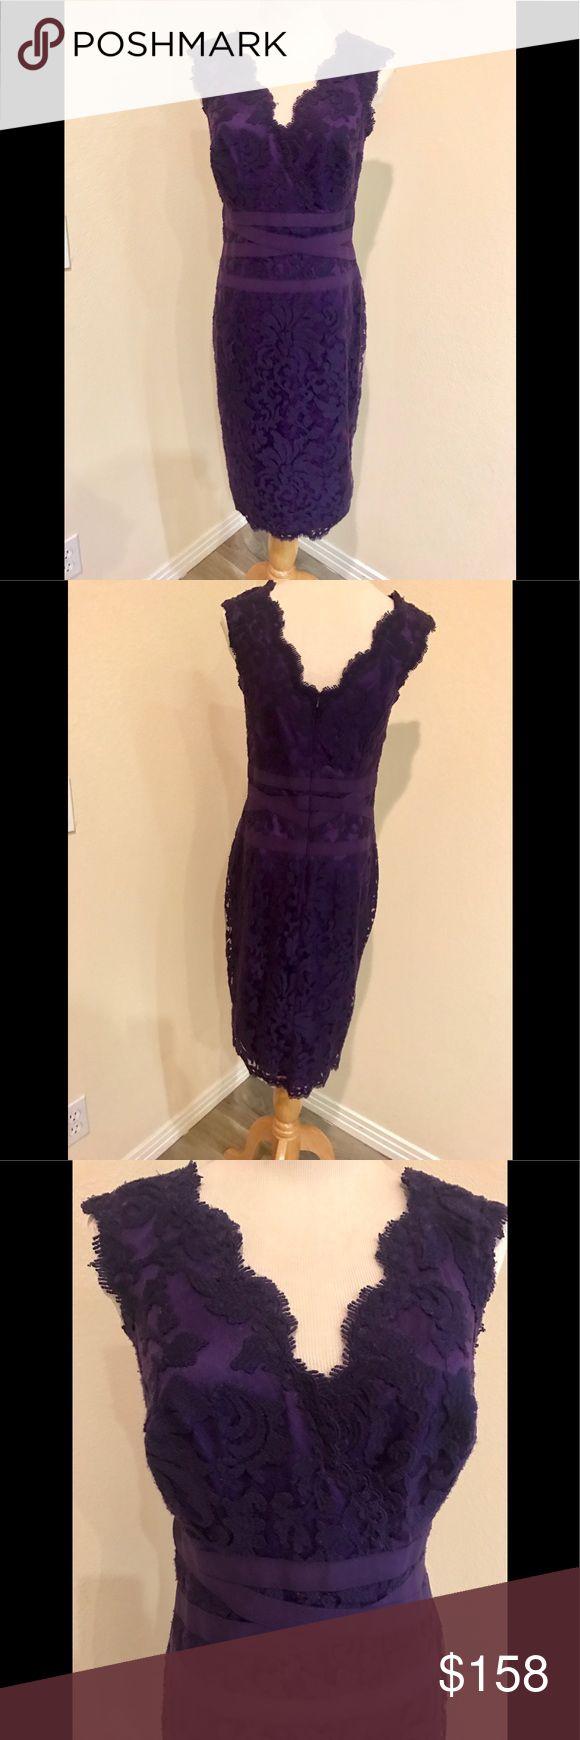 Tadashi Shoji purple v-neck lace cocktail dress NWT.  CHEST: 35 WAIST: 27.5 HIPS: 38 Fit more like Size 8/10 Tadashi Shoji Dresses Midi